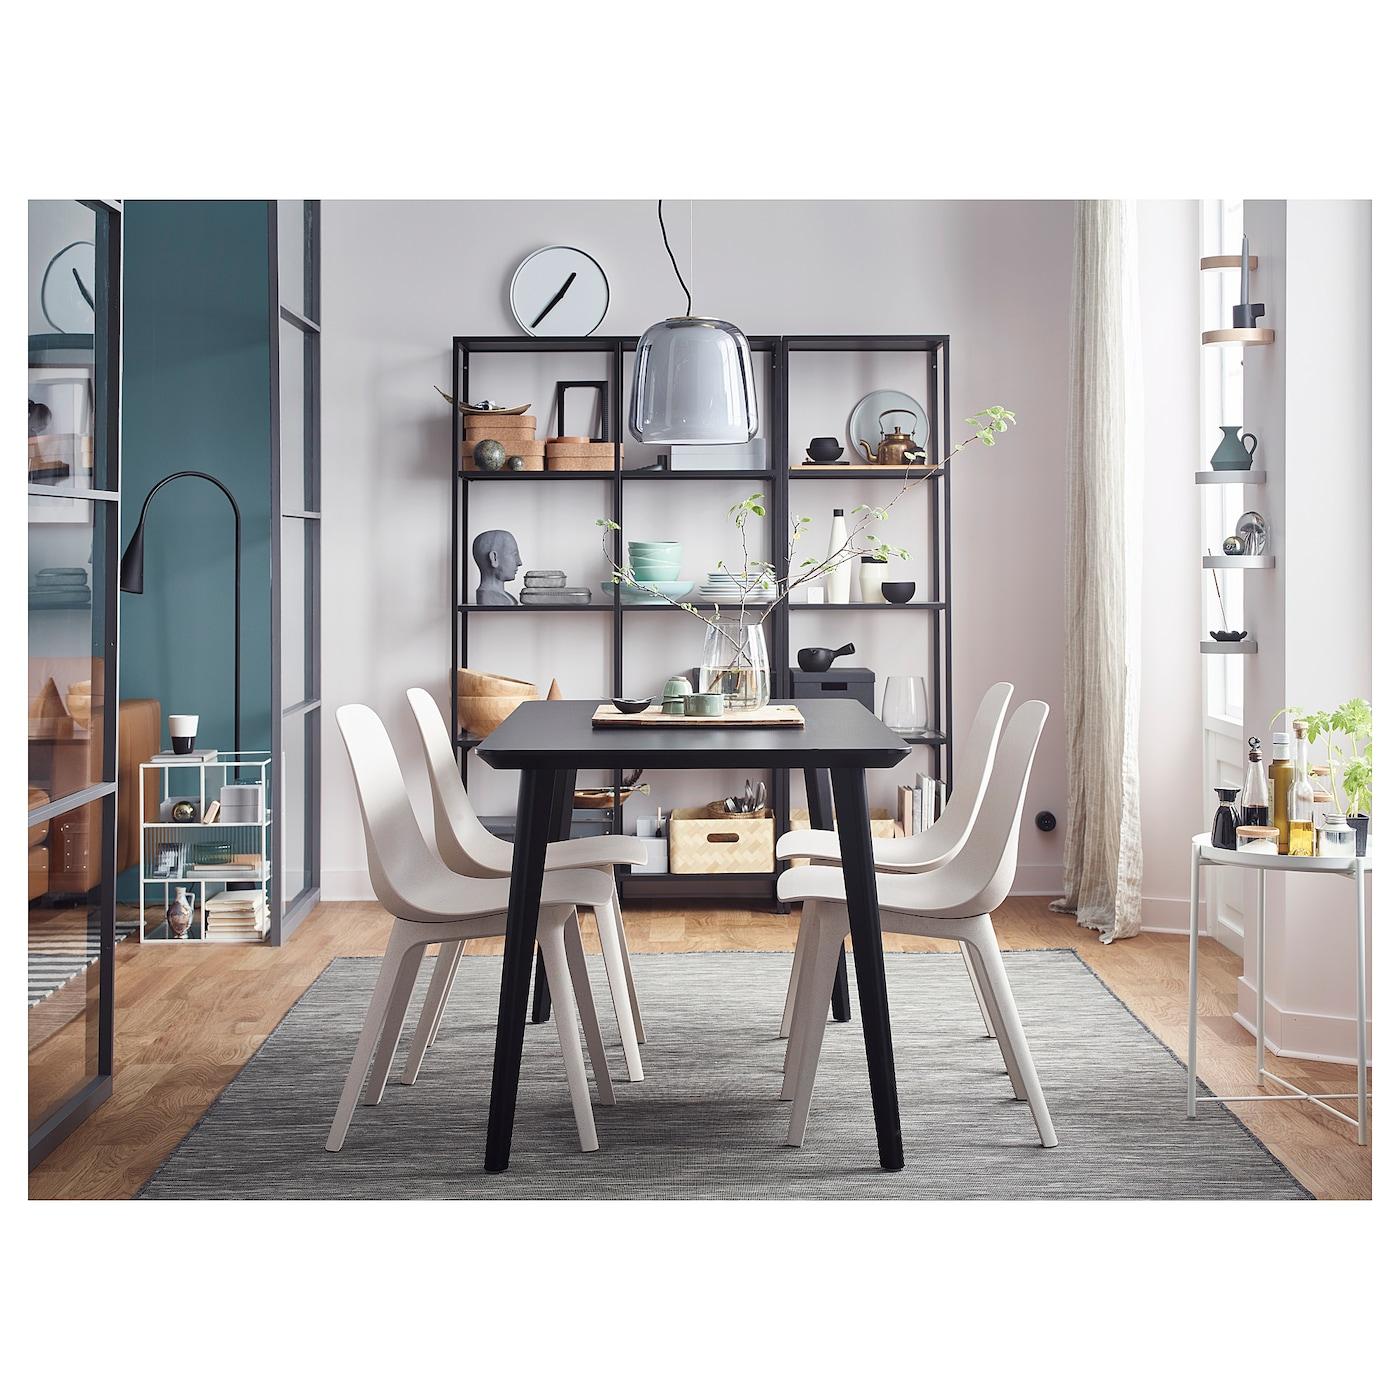 ODGER Chair - white/beige